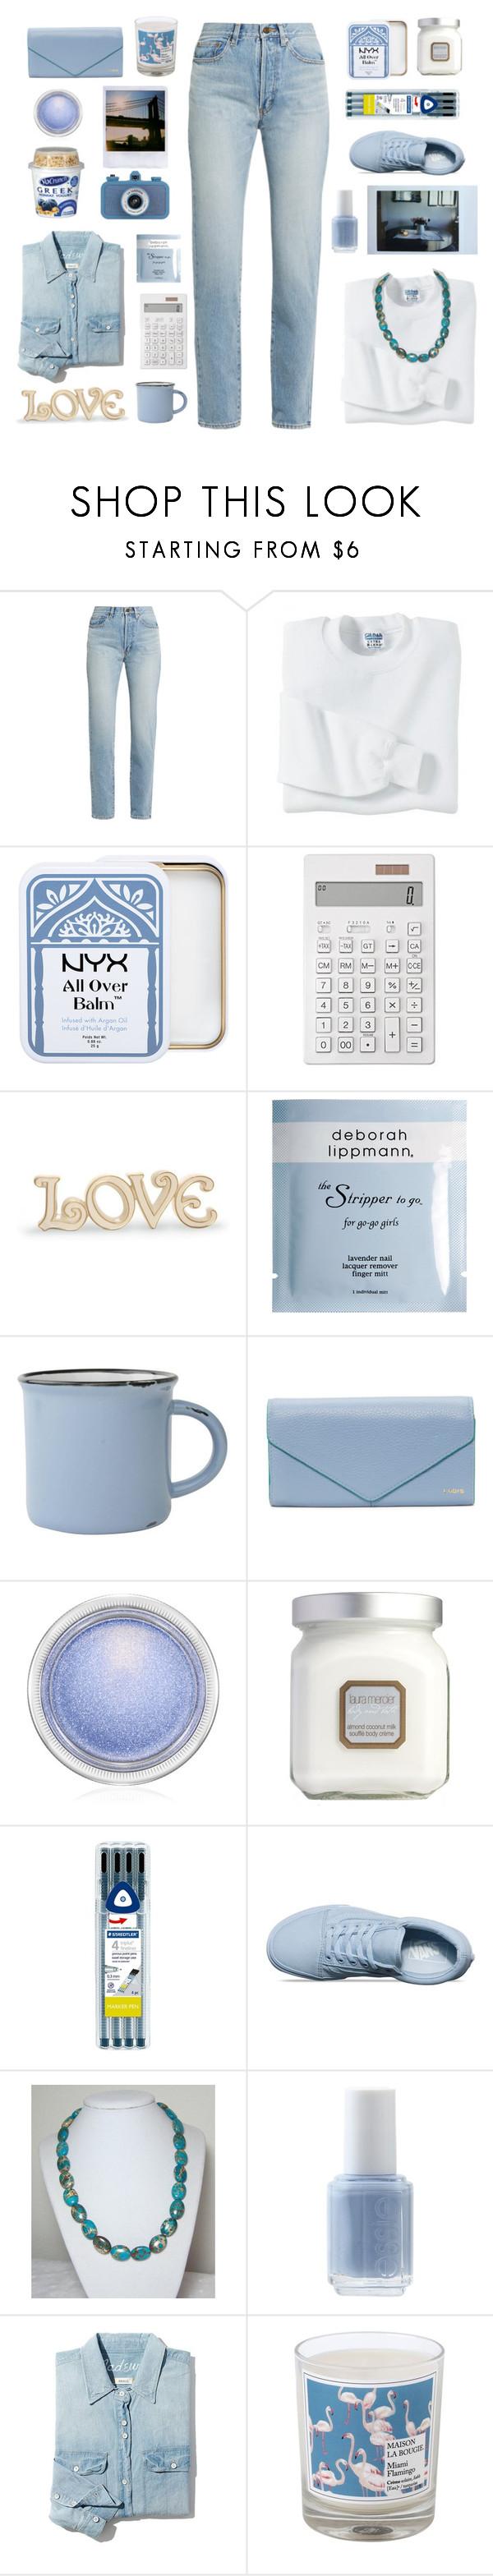 """baby blue"" by tinkertot ❤ liked on Polyvore featuring Yves Saint Laurent, Gildan, Muji, Lenox, Deborah Lippmann, MAC Cosmetics, Laura Mercier, SAM, Vans and Polaroid"